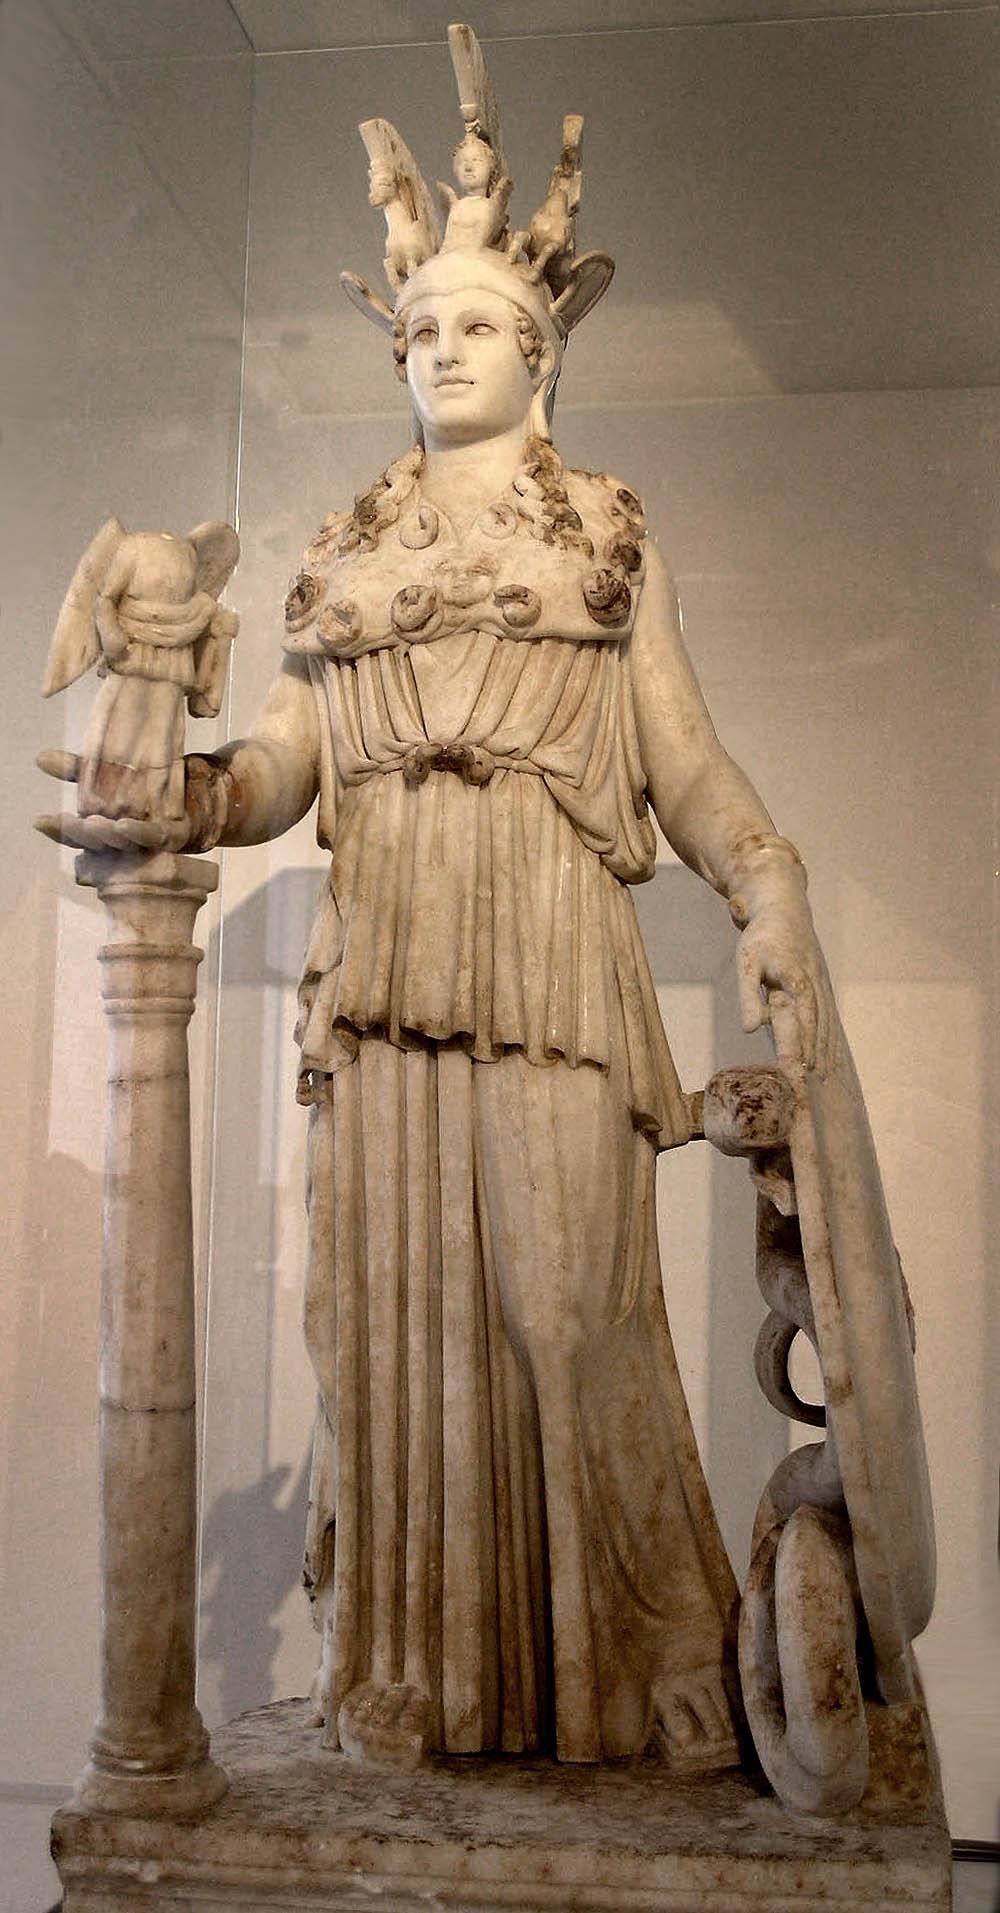 Atena, patrona diino de Ateno; (romepoka statuo de Atena Partena, Nacia Arkeologia Muzeo)